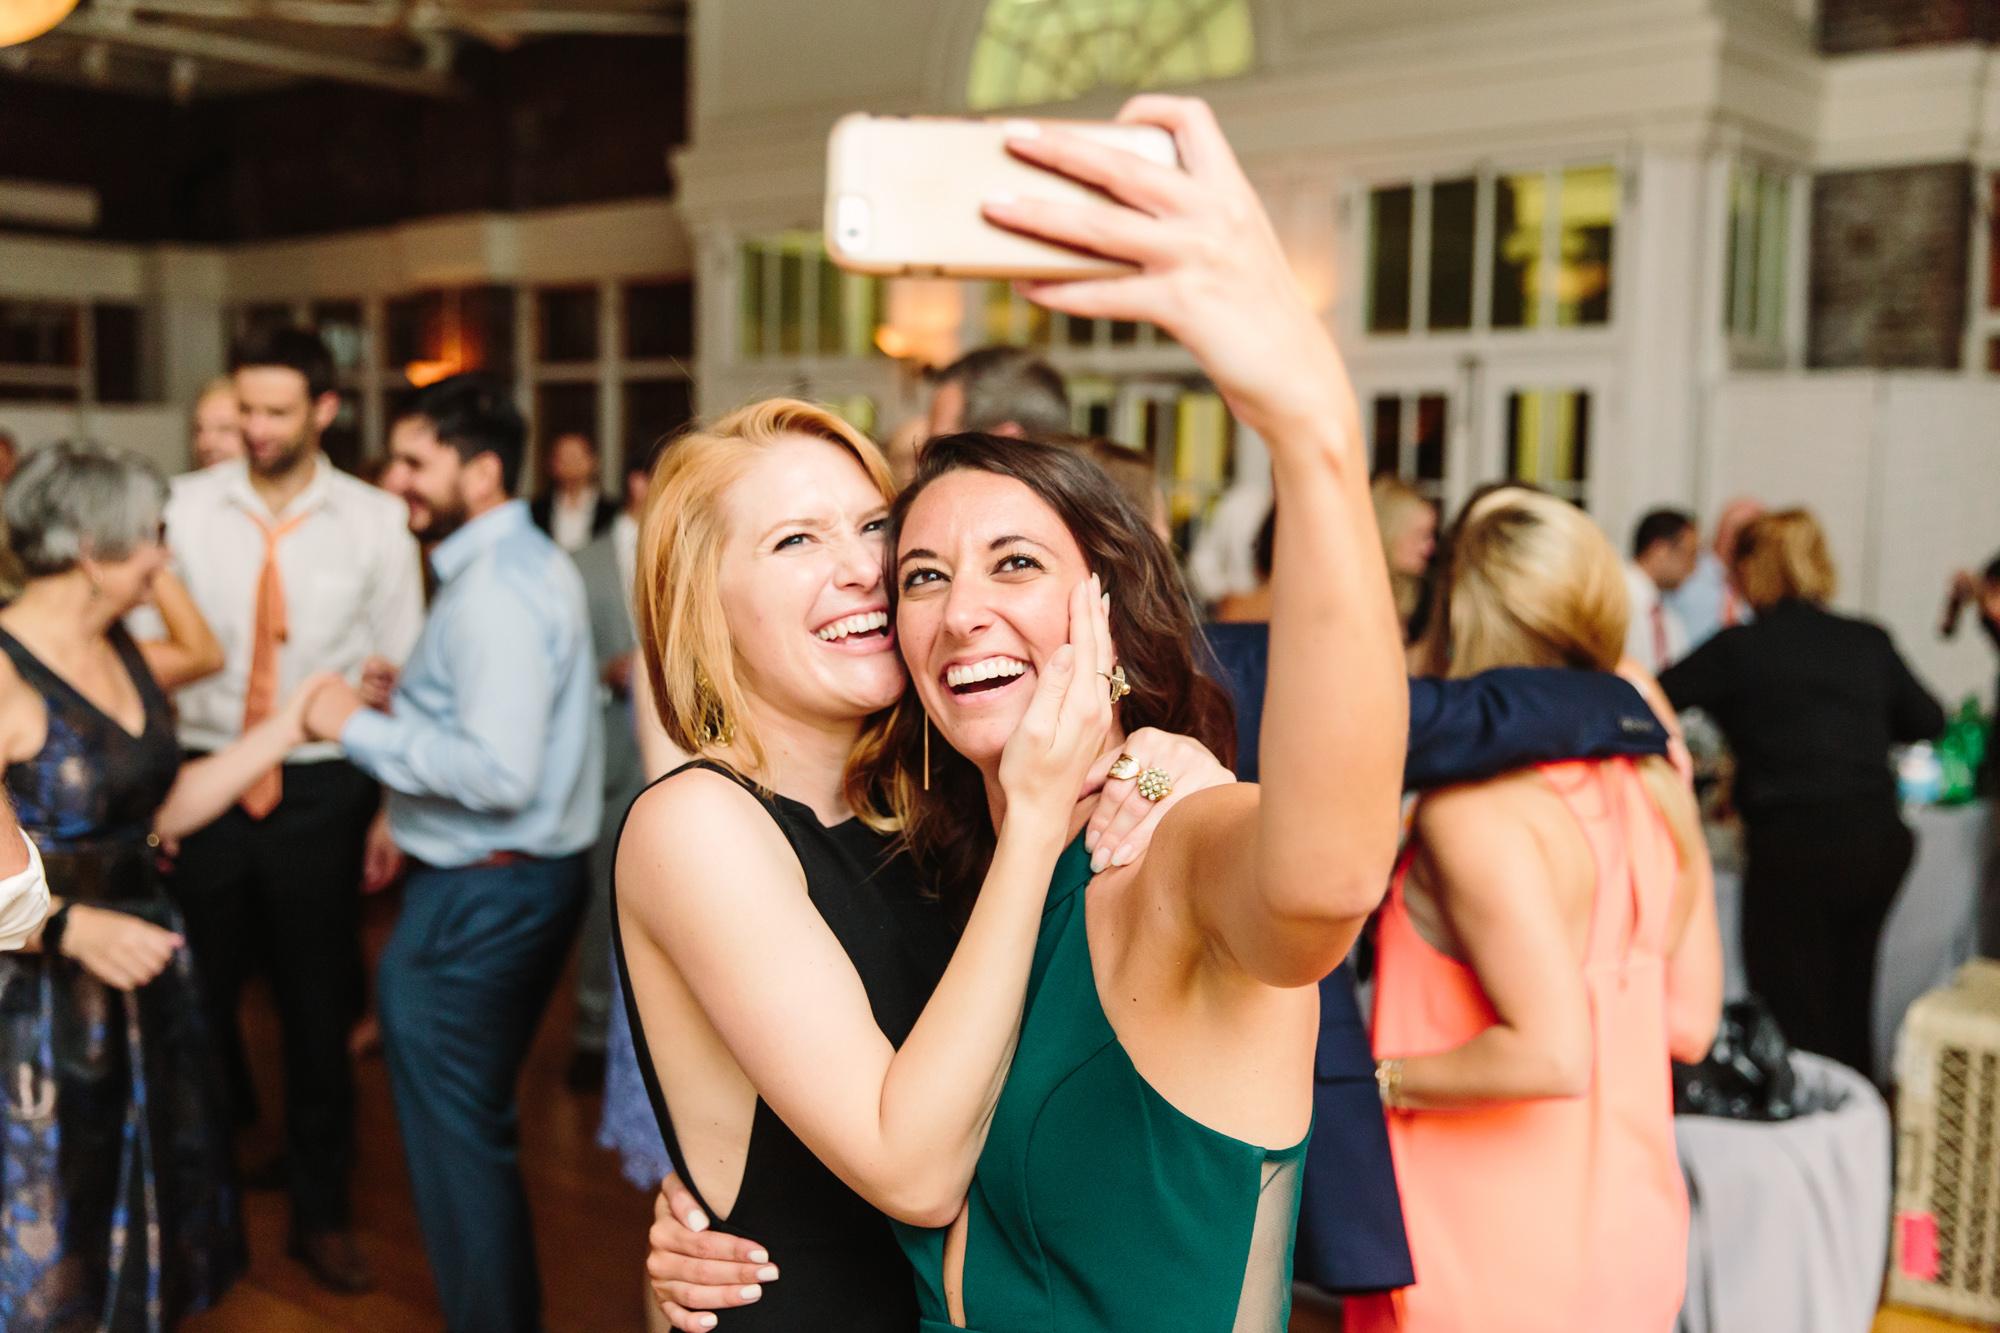 47_Kate_Sam_Picnic_House_Wedding_Brooklyn_NY_Tanya_Salazar_Photography_1108.jpg